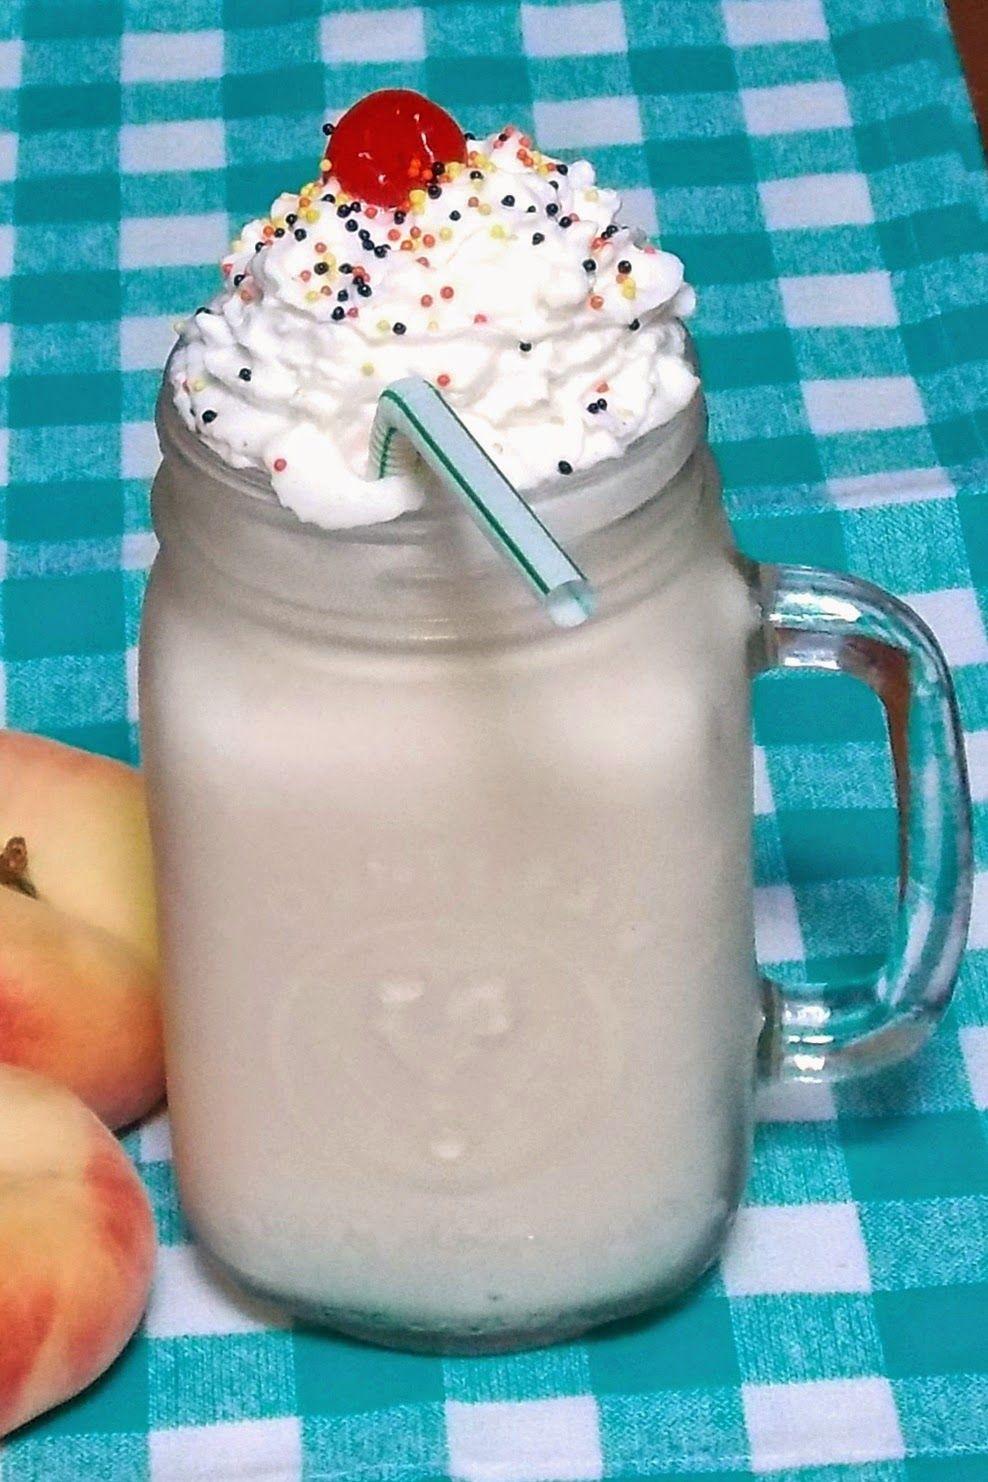 Kickin Peach Milkshake Peach Peachschnapps Milkshake Peach Milkshake Ice Cream Drinks Milkshake